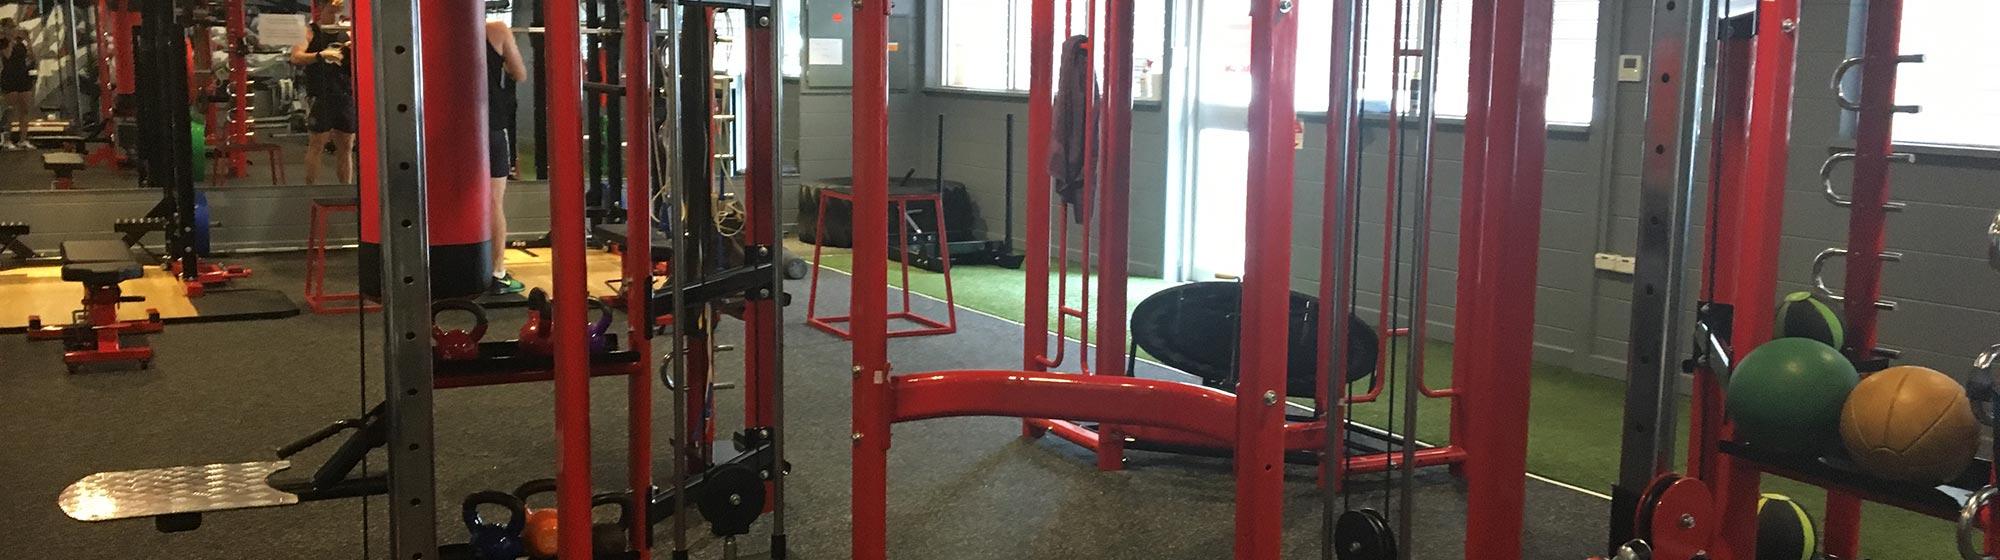 fitness centre darwin